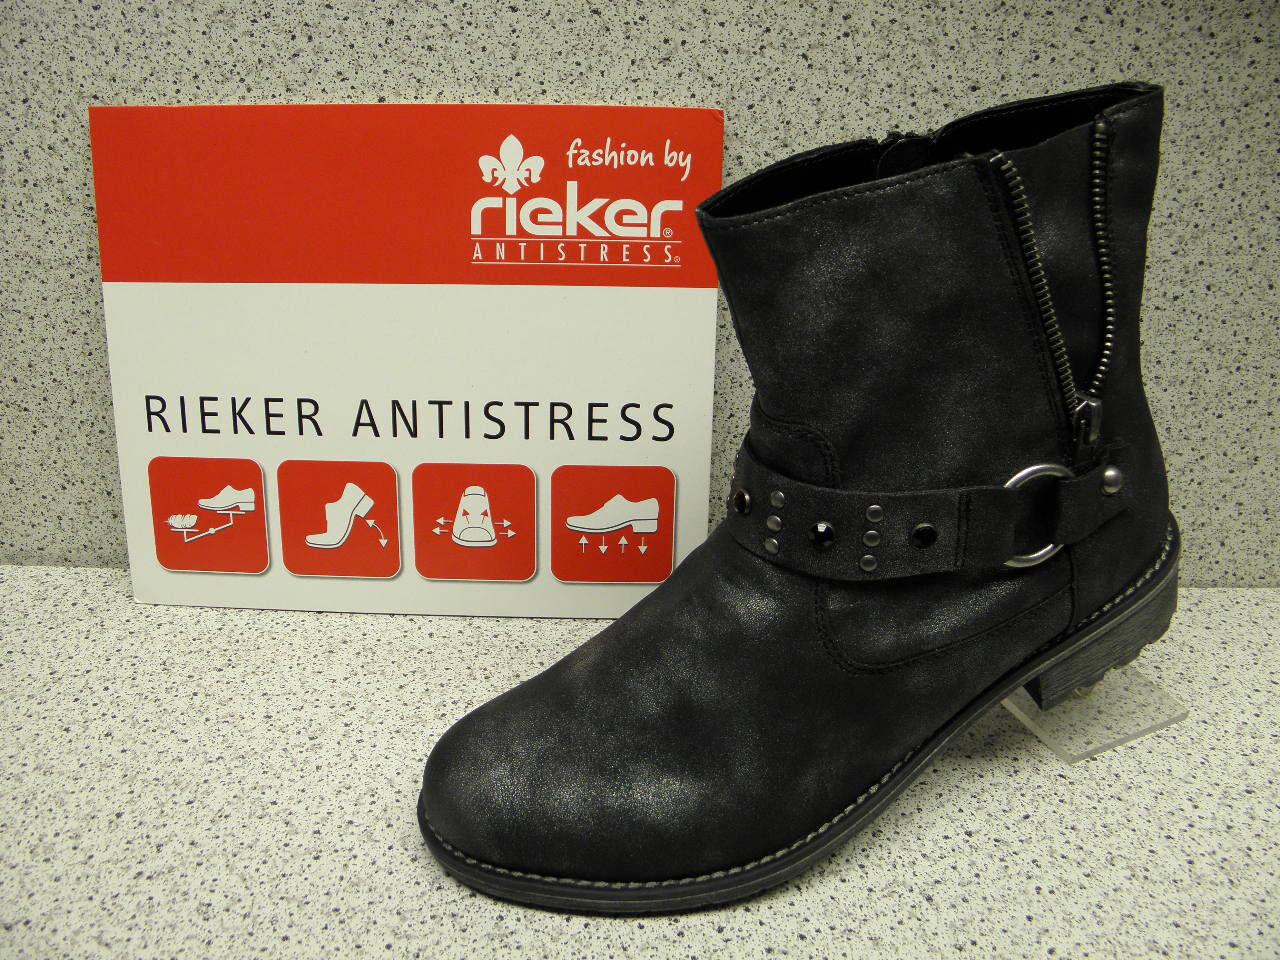 rieker ® SALE bisher   + gratis Premium - Socken K3485-45 (R156)